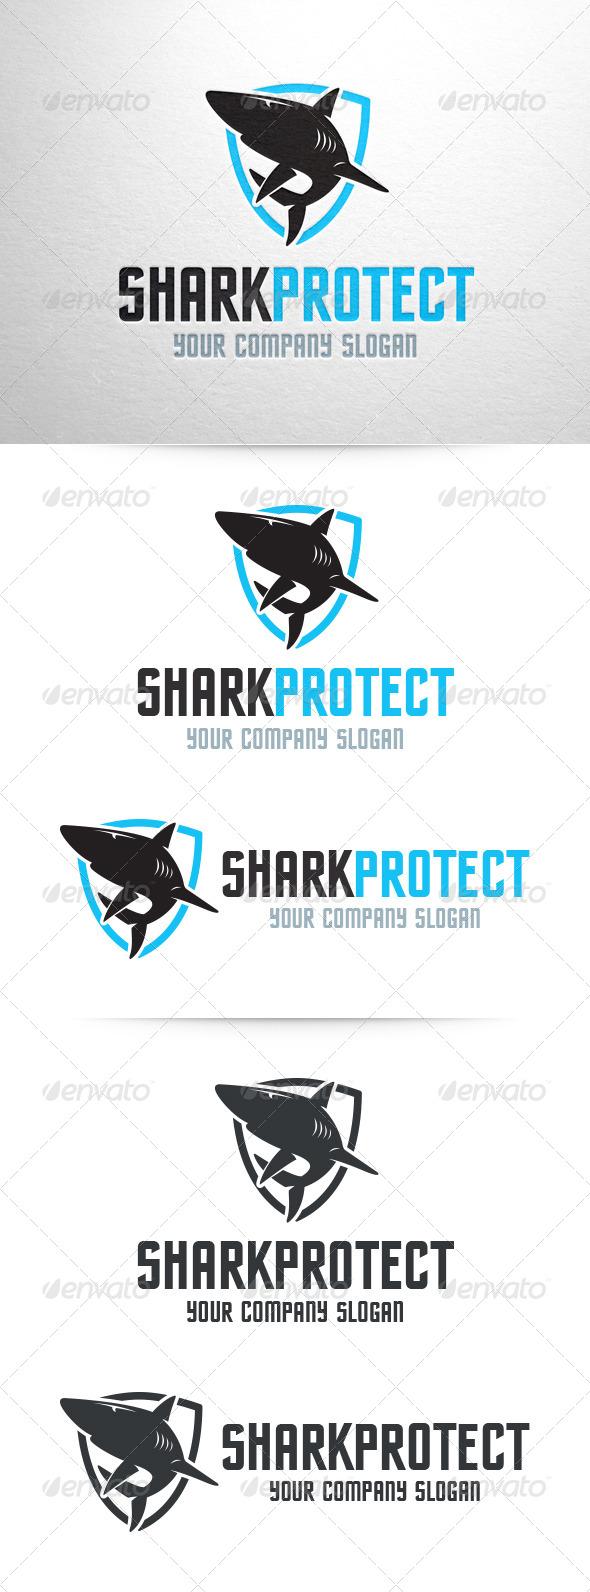 Shark Protect Logo Template - Animals Logo Templates